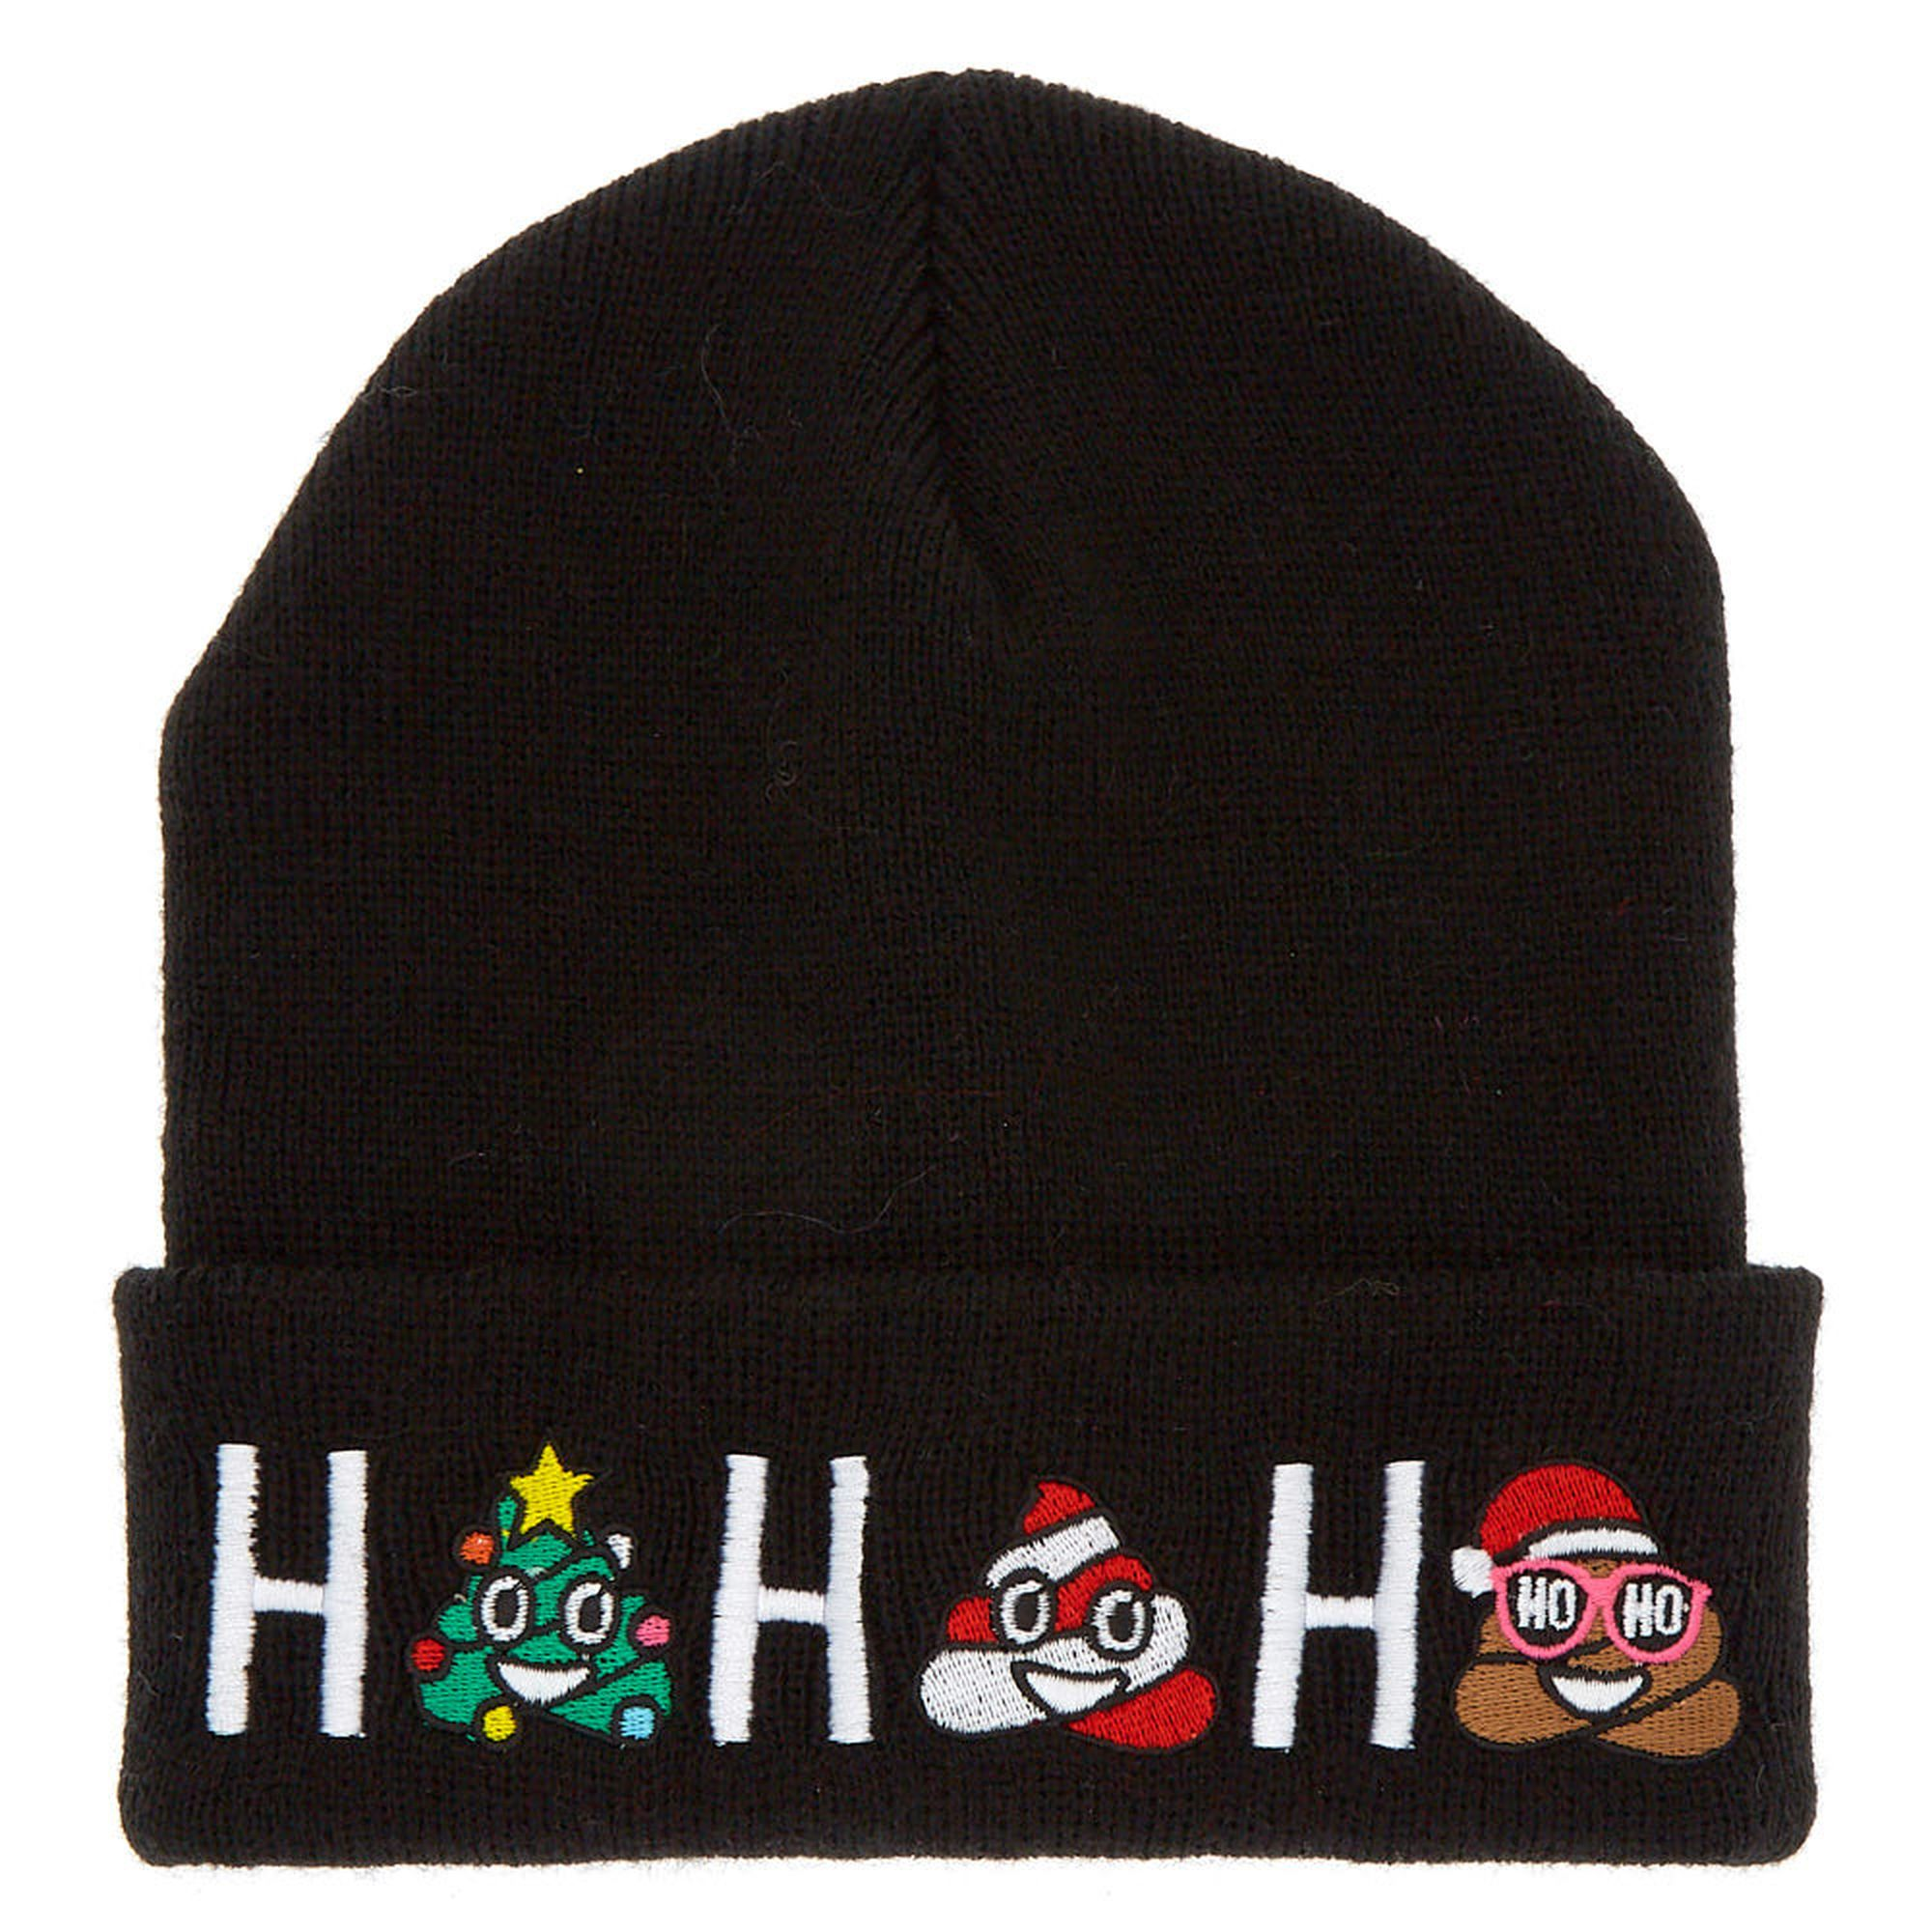 fb1f2ad67ca Ho Ho Ho Poo Beanie - Black